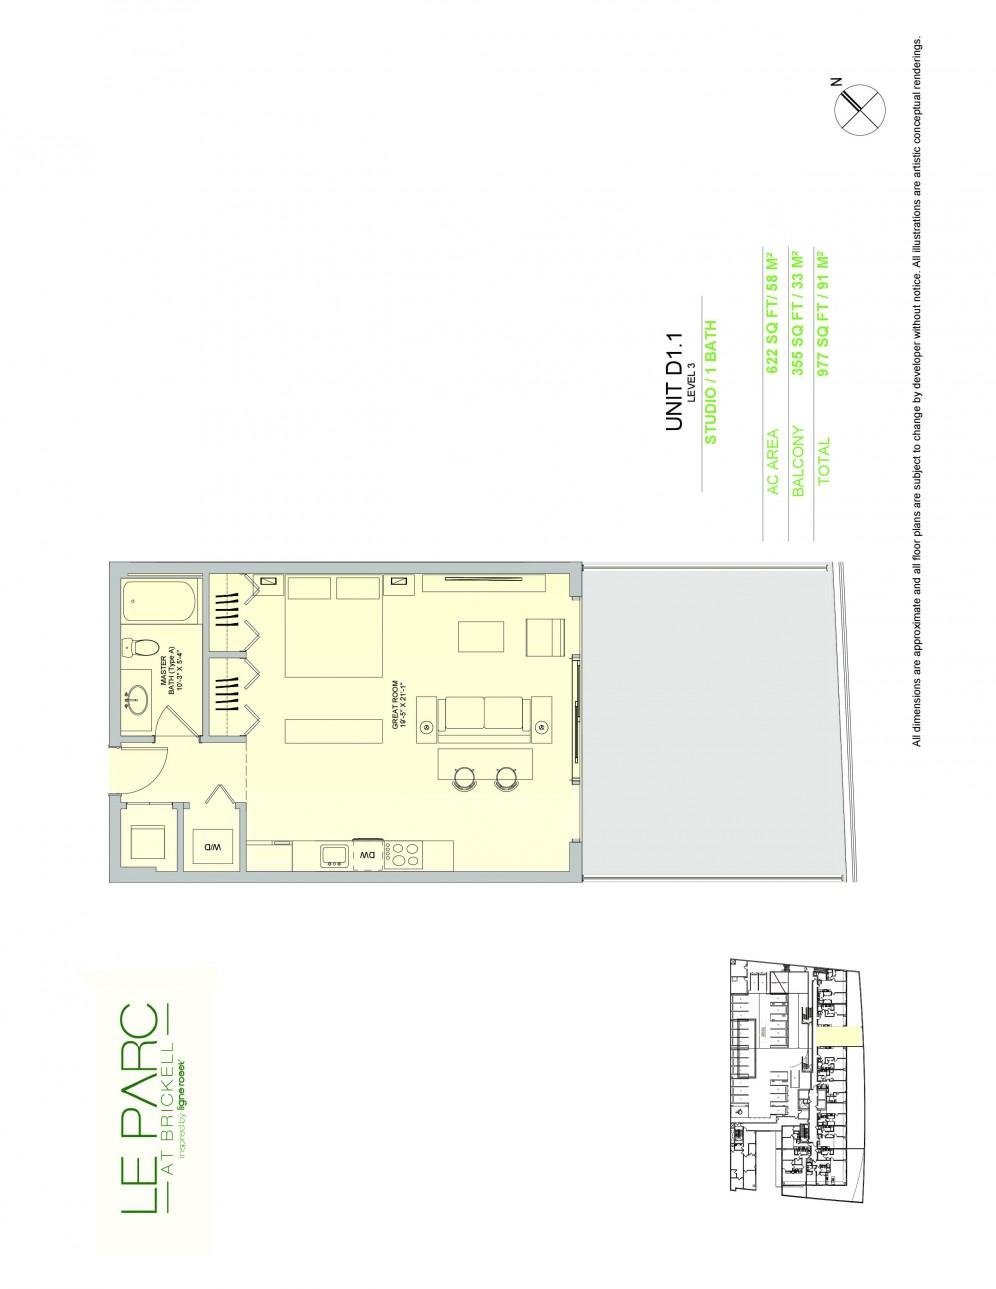 Floor Plan Model D1 1, Line11 atLe Parc at Brickell, Miami